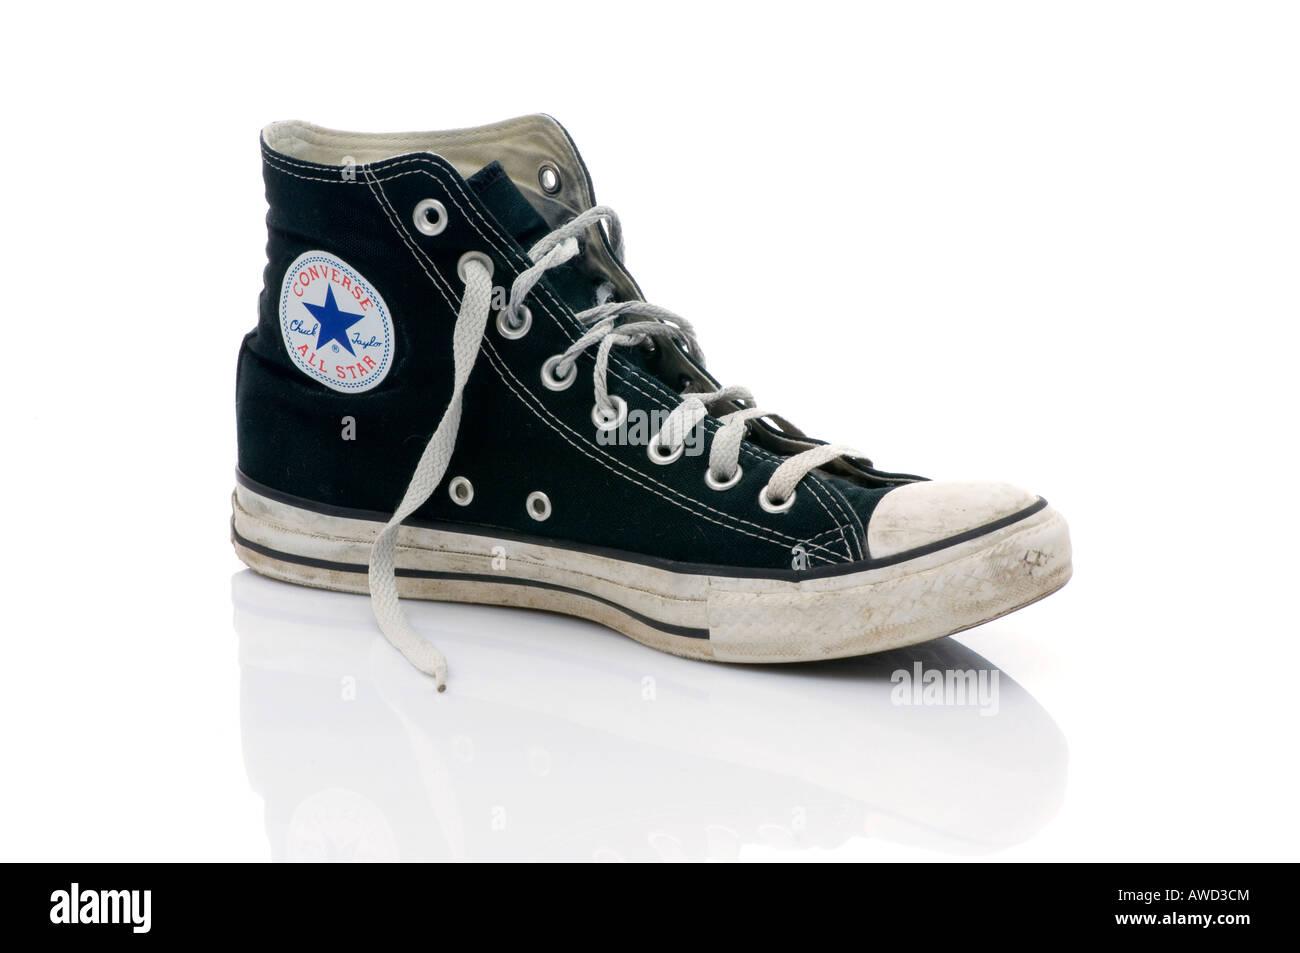 converse all star chuck taylor design